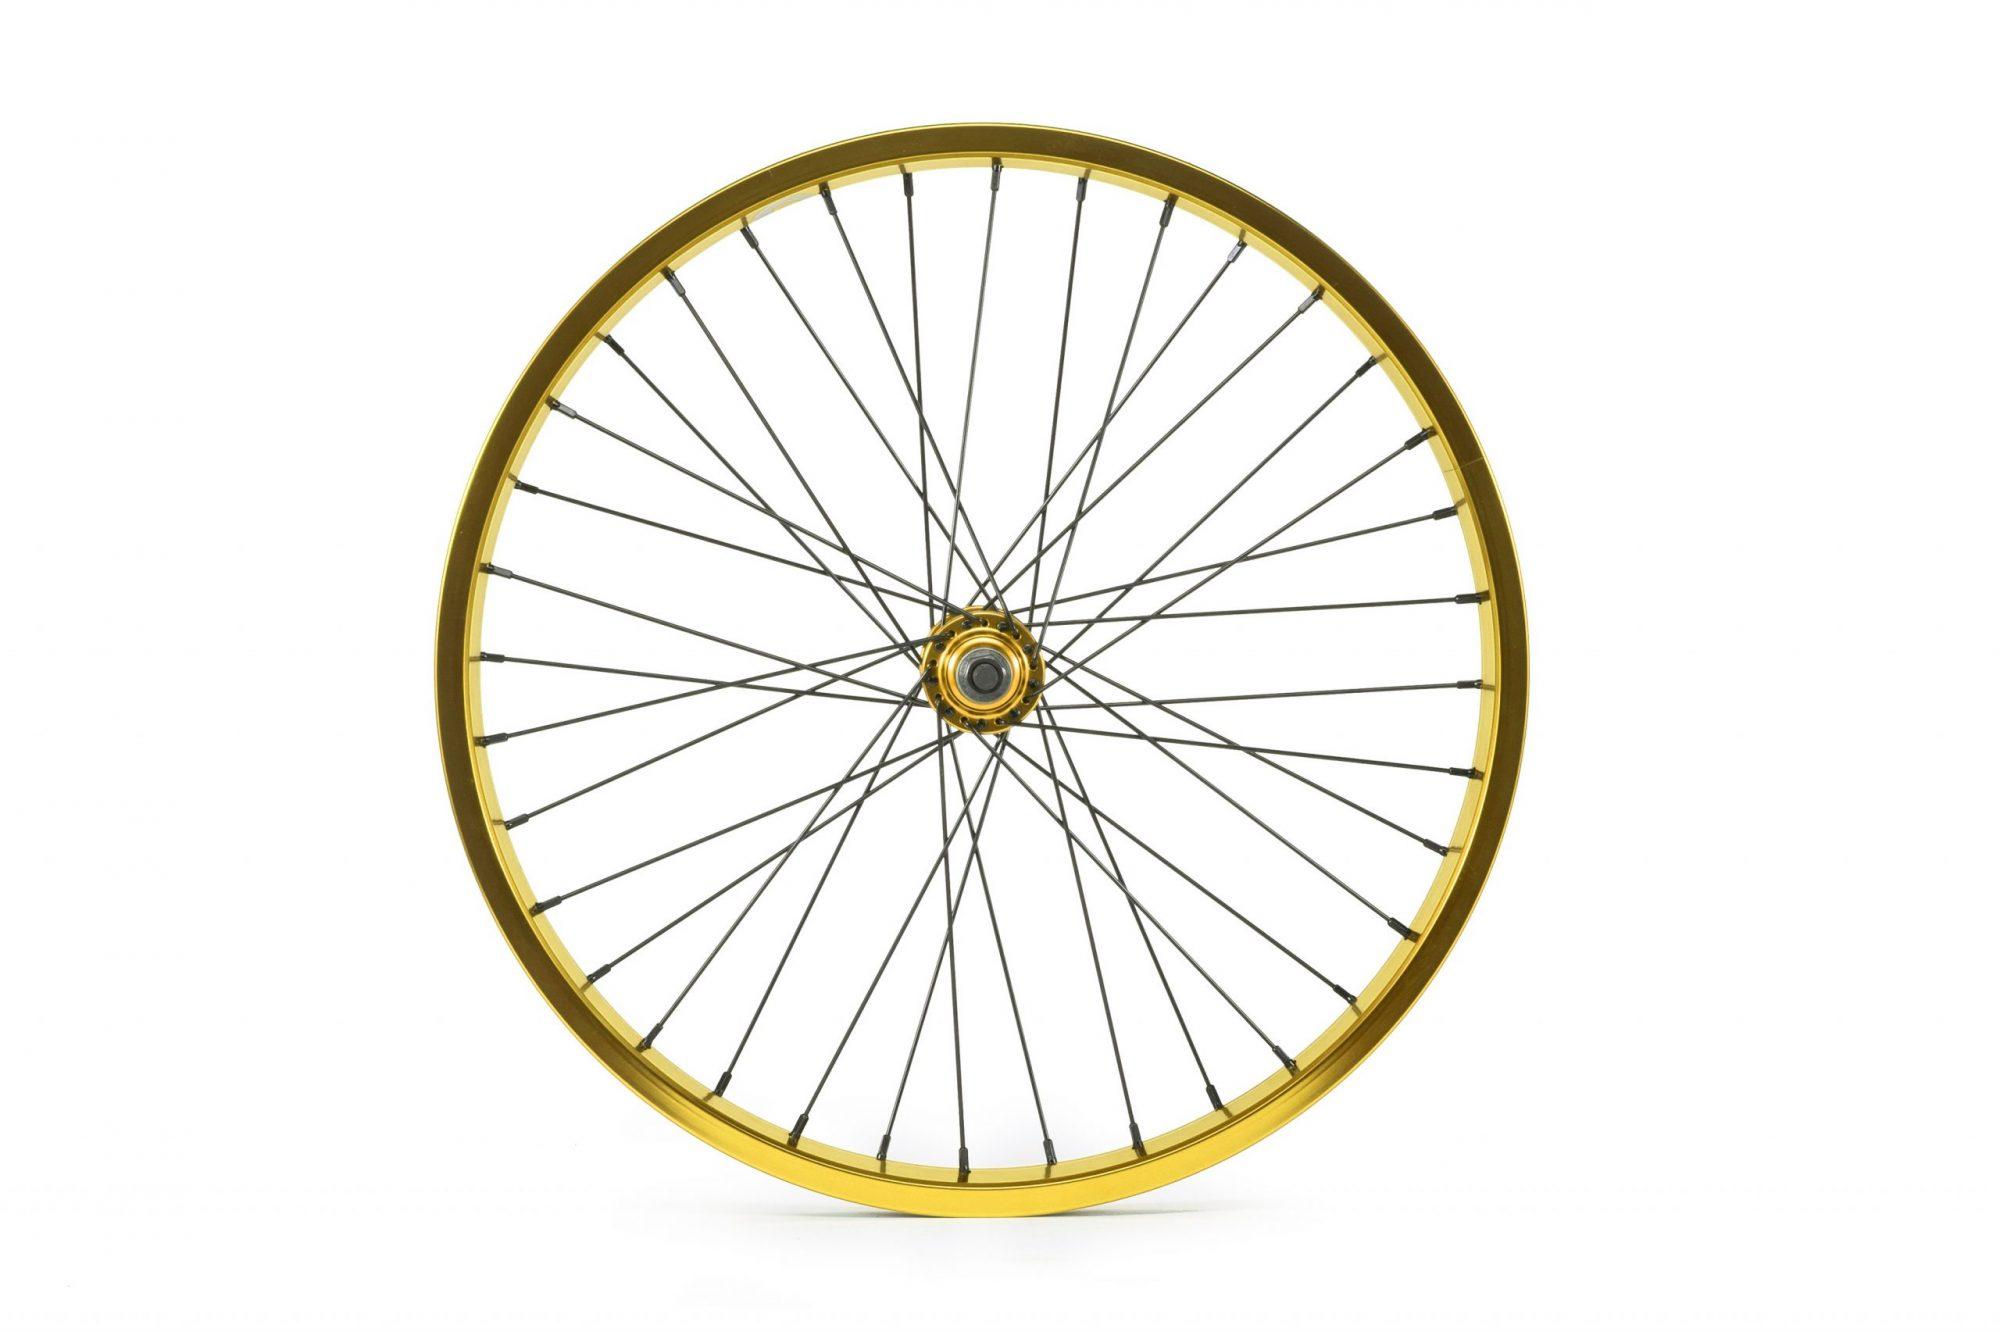 Salt_Everest_flipflop_rear_wheel_gold_01